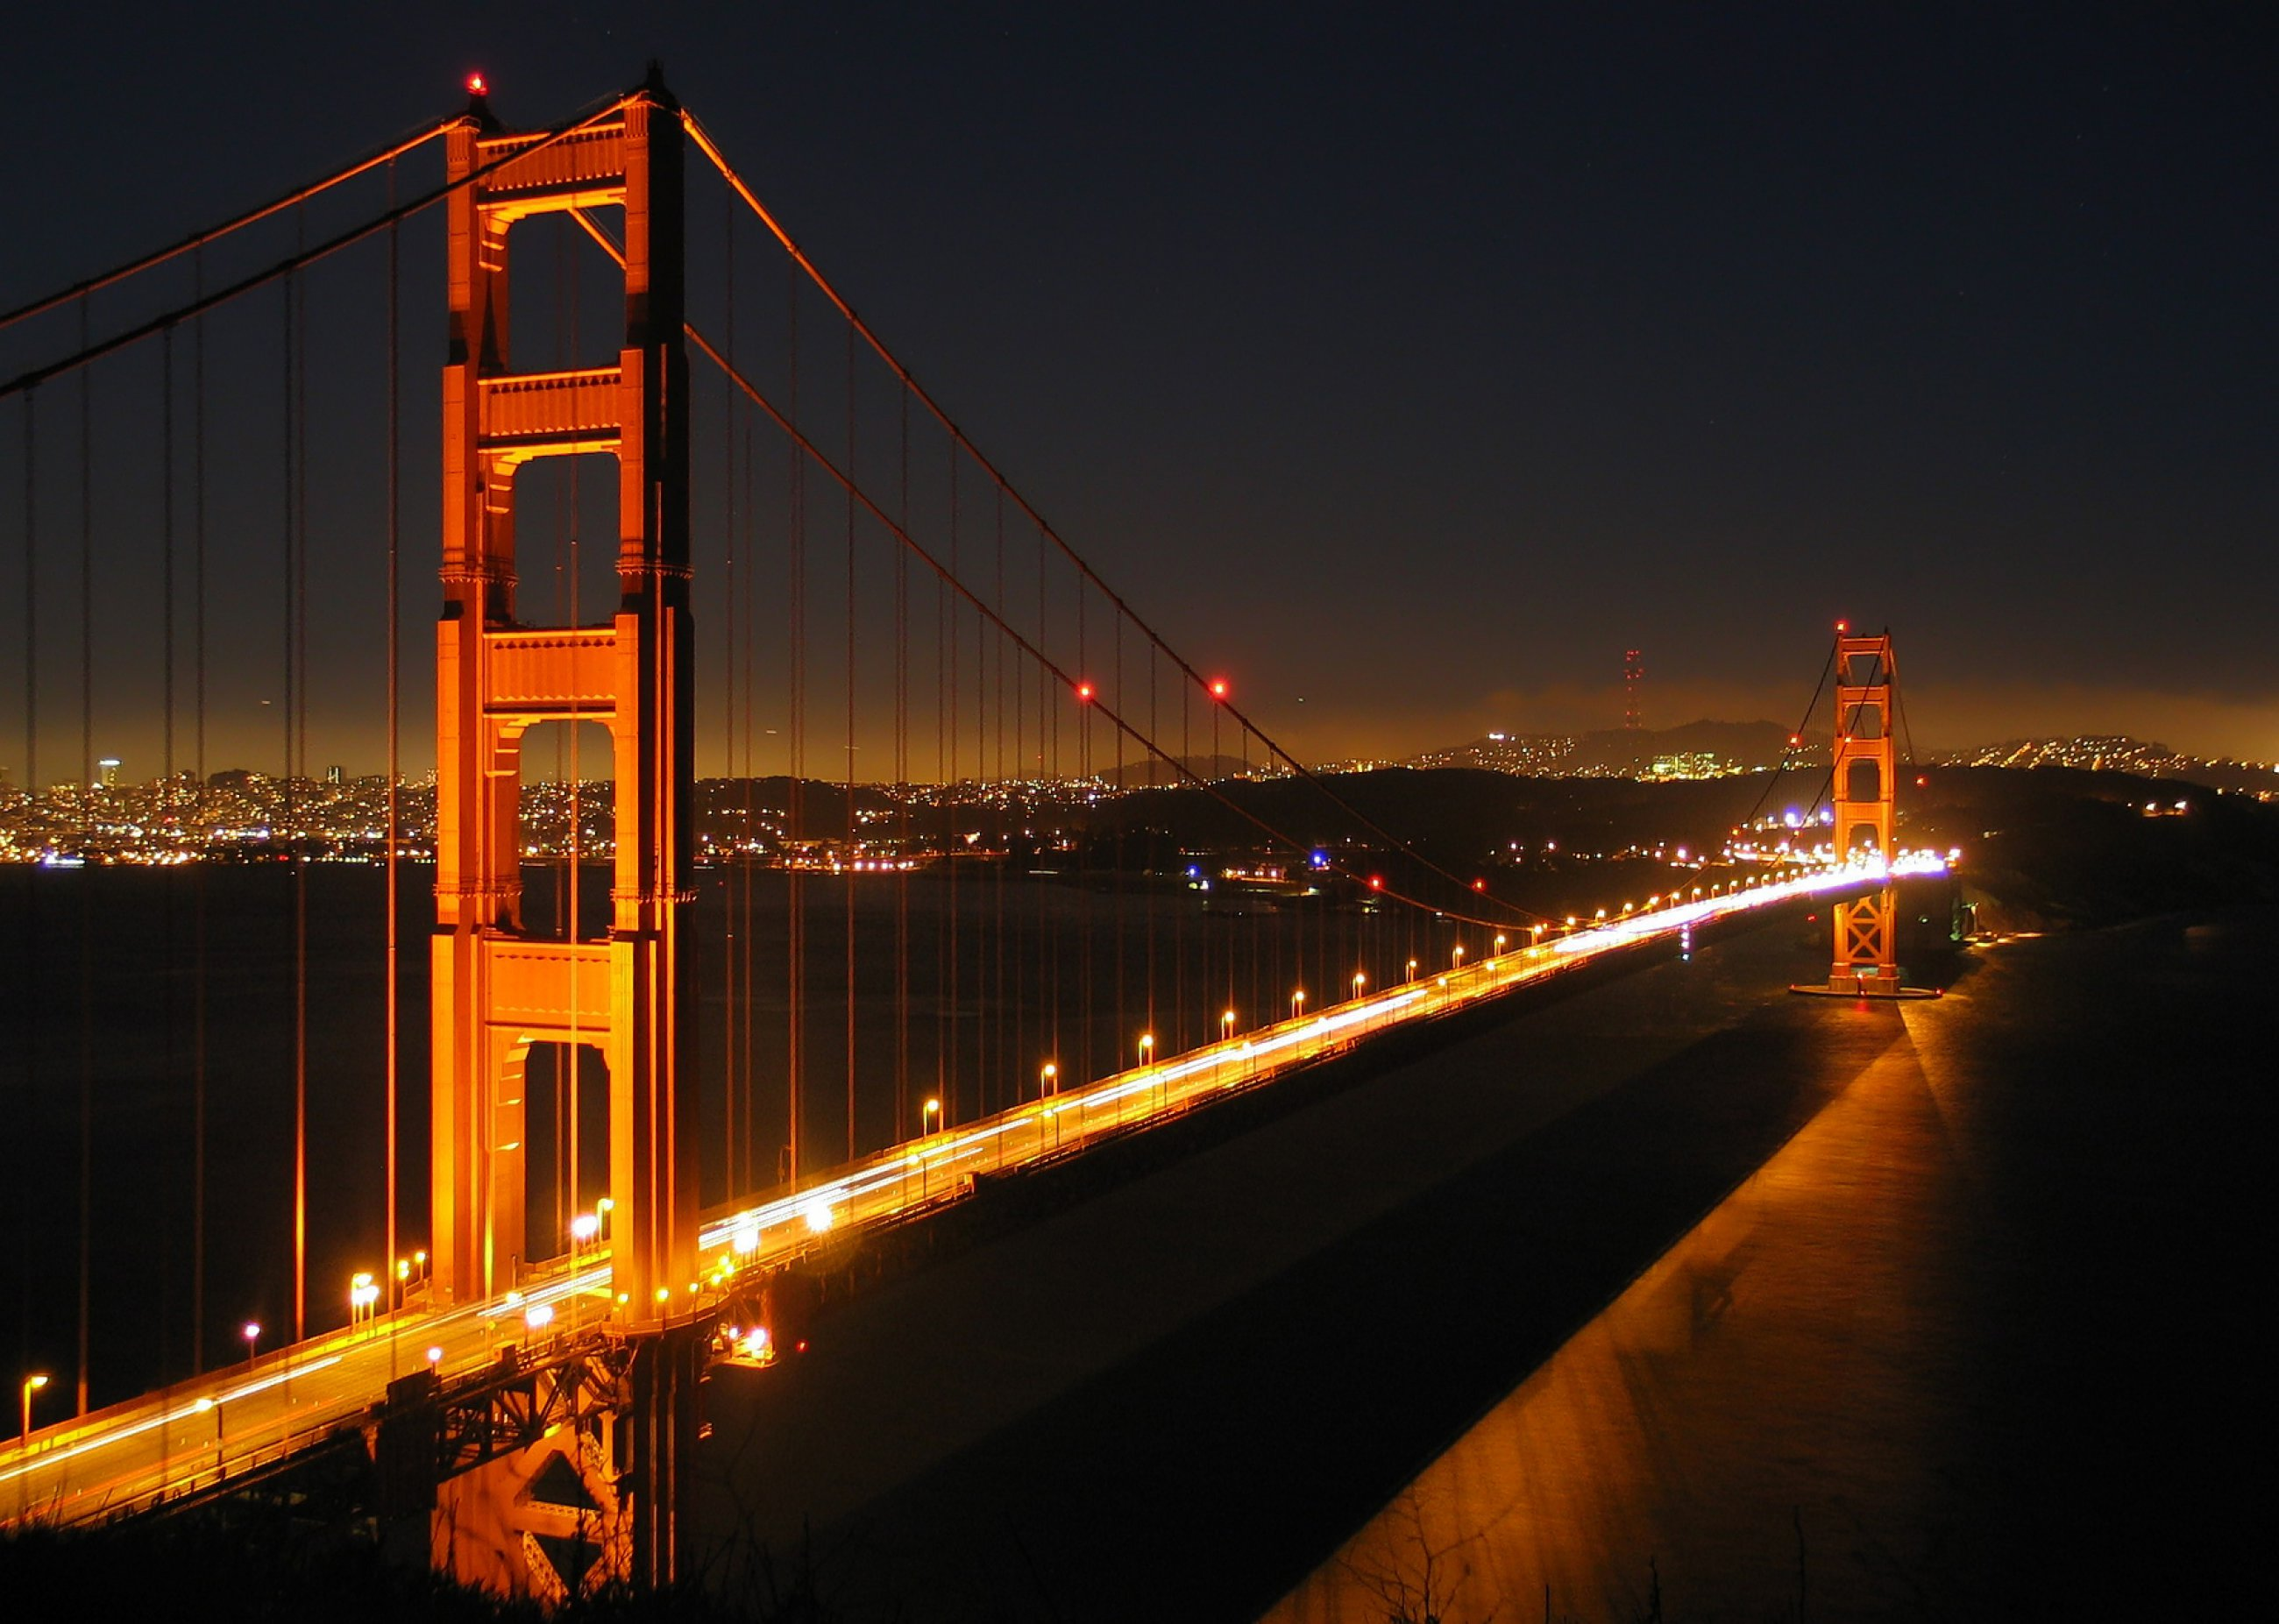 https://bubo.sk/uploads/galleries/16490/sf-wikipedia-ggb-by-night.jpg